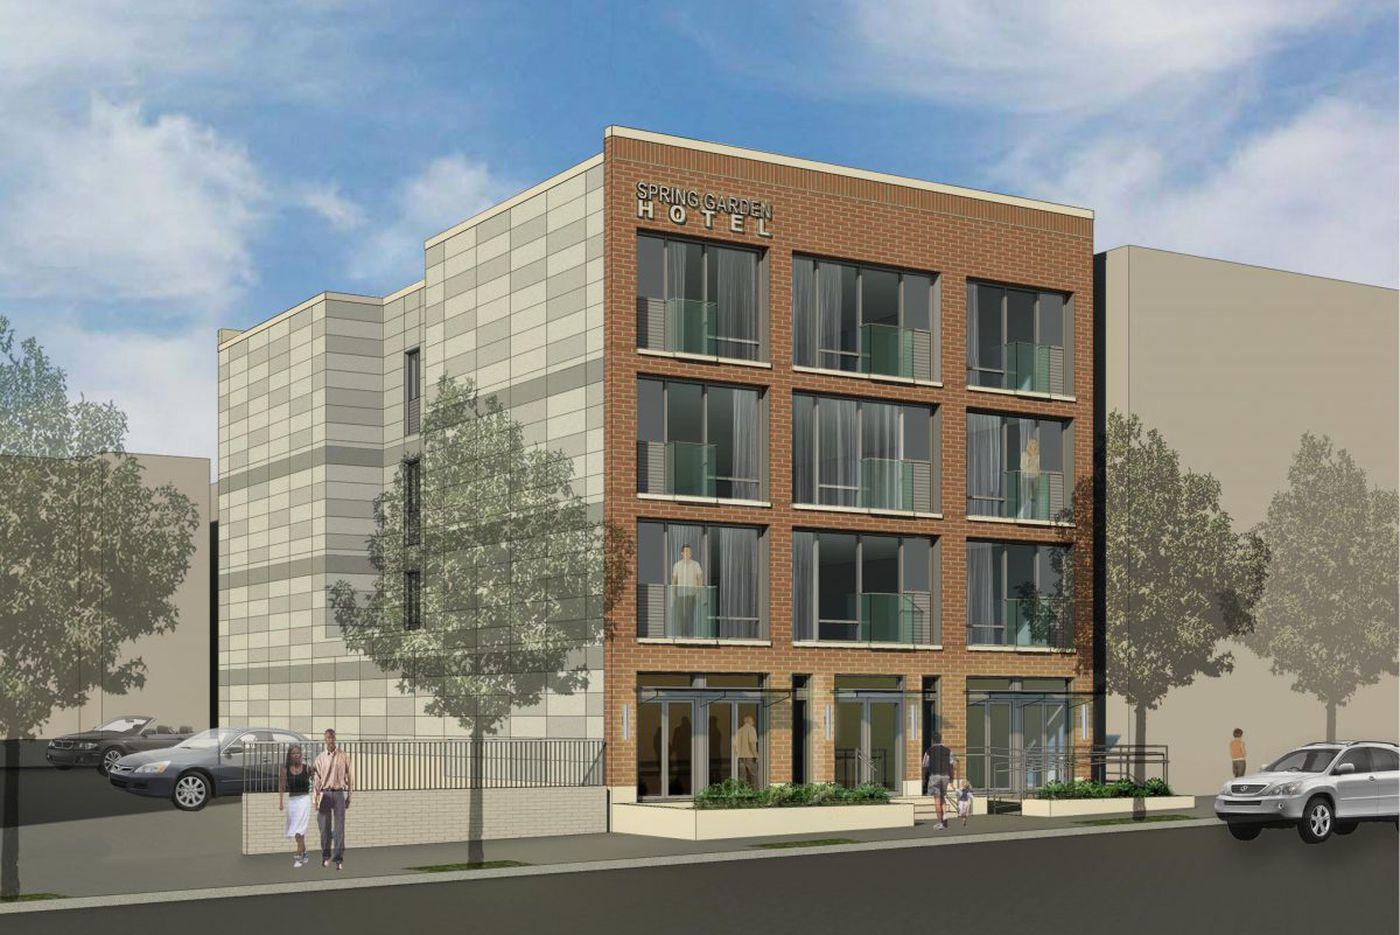 New mini-sized hotel planned near Art Museum